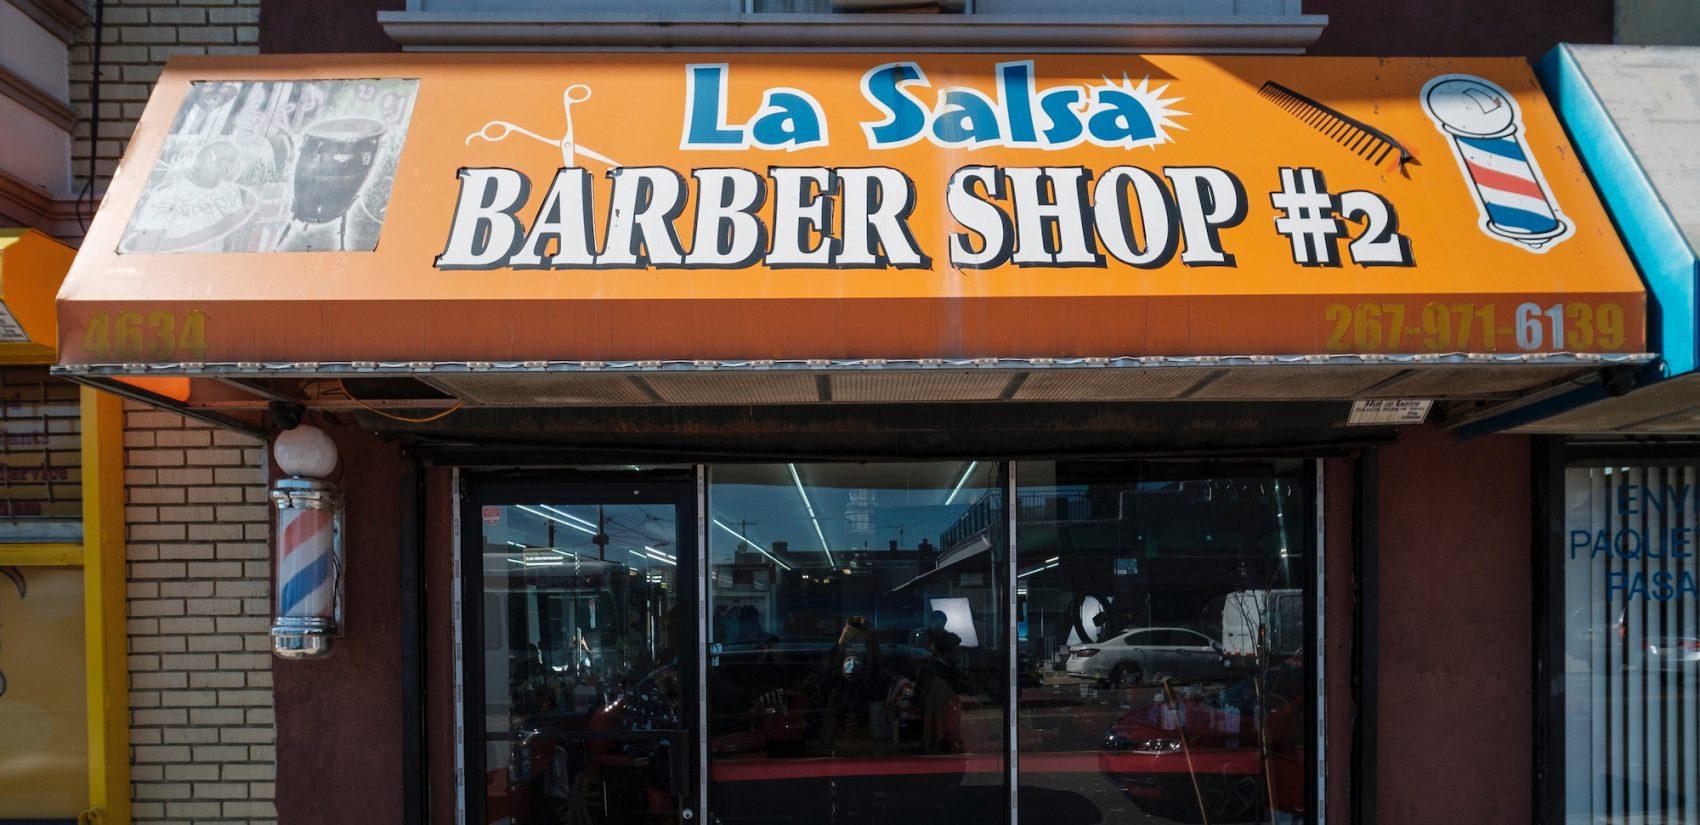 "La Salsa Barber Shop #2 is the second shop that Raymon ""La Salsa"" Rincón owns on North Fifth Street. | La Salsa Barber Shop # 2 es la segunda tienda que Raymon ""La Salsa"" Rincón tiene en North Fifth Street.(Photo by Bernardo Morillo/WHYY)"